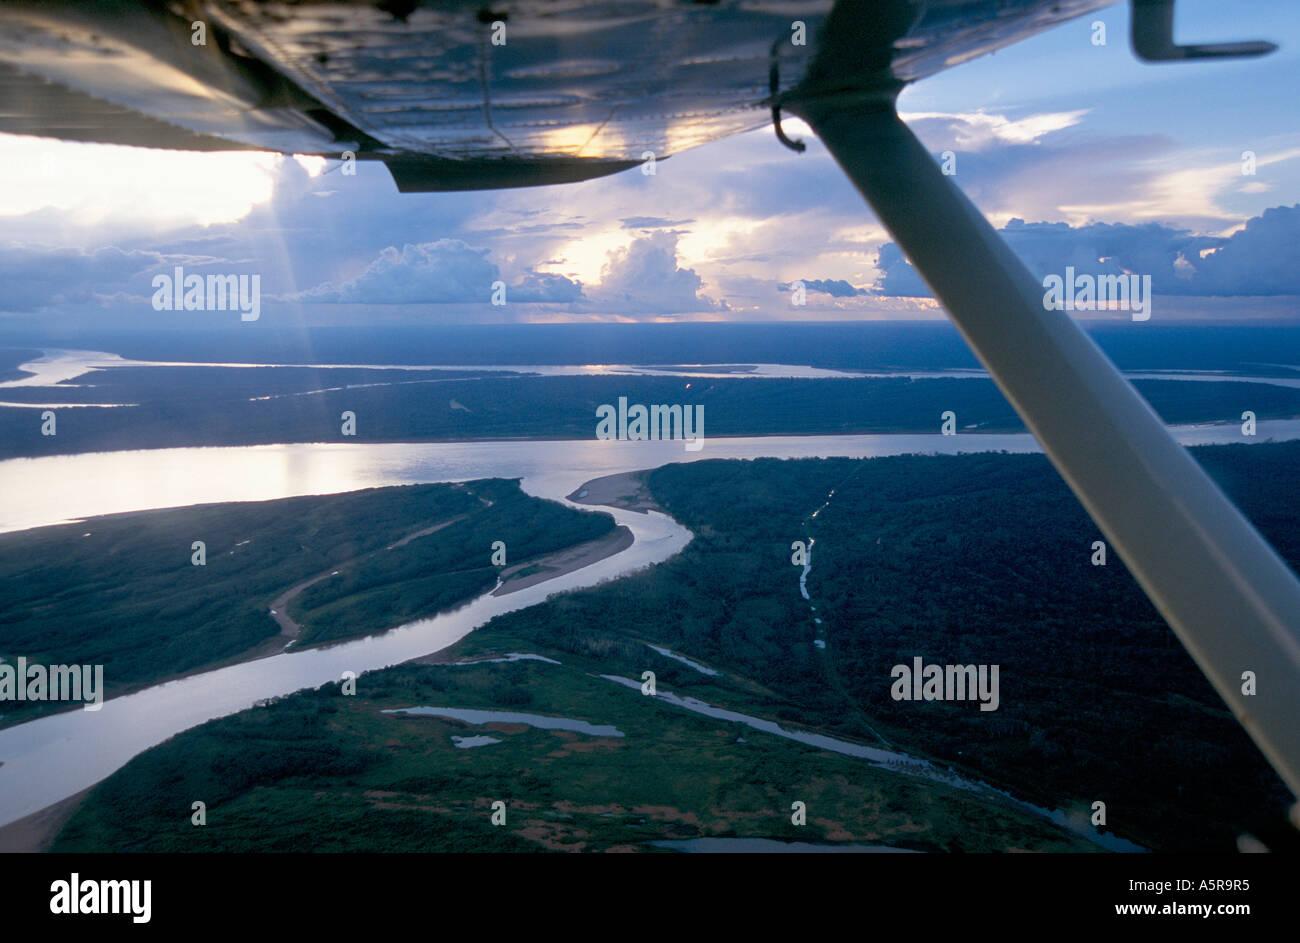 OVERFLYING THE AMAZON JUNGLE, BRAZIL.  DEC 2000 - Stock Image